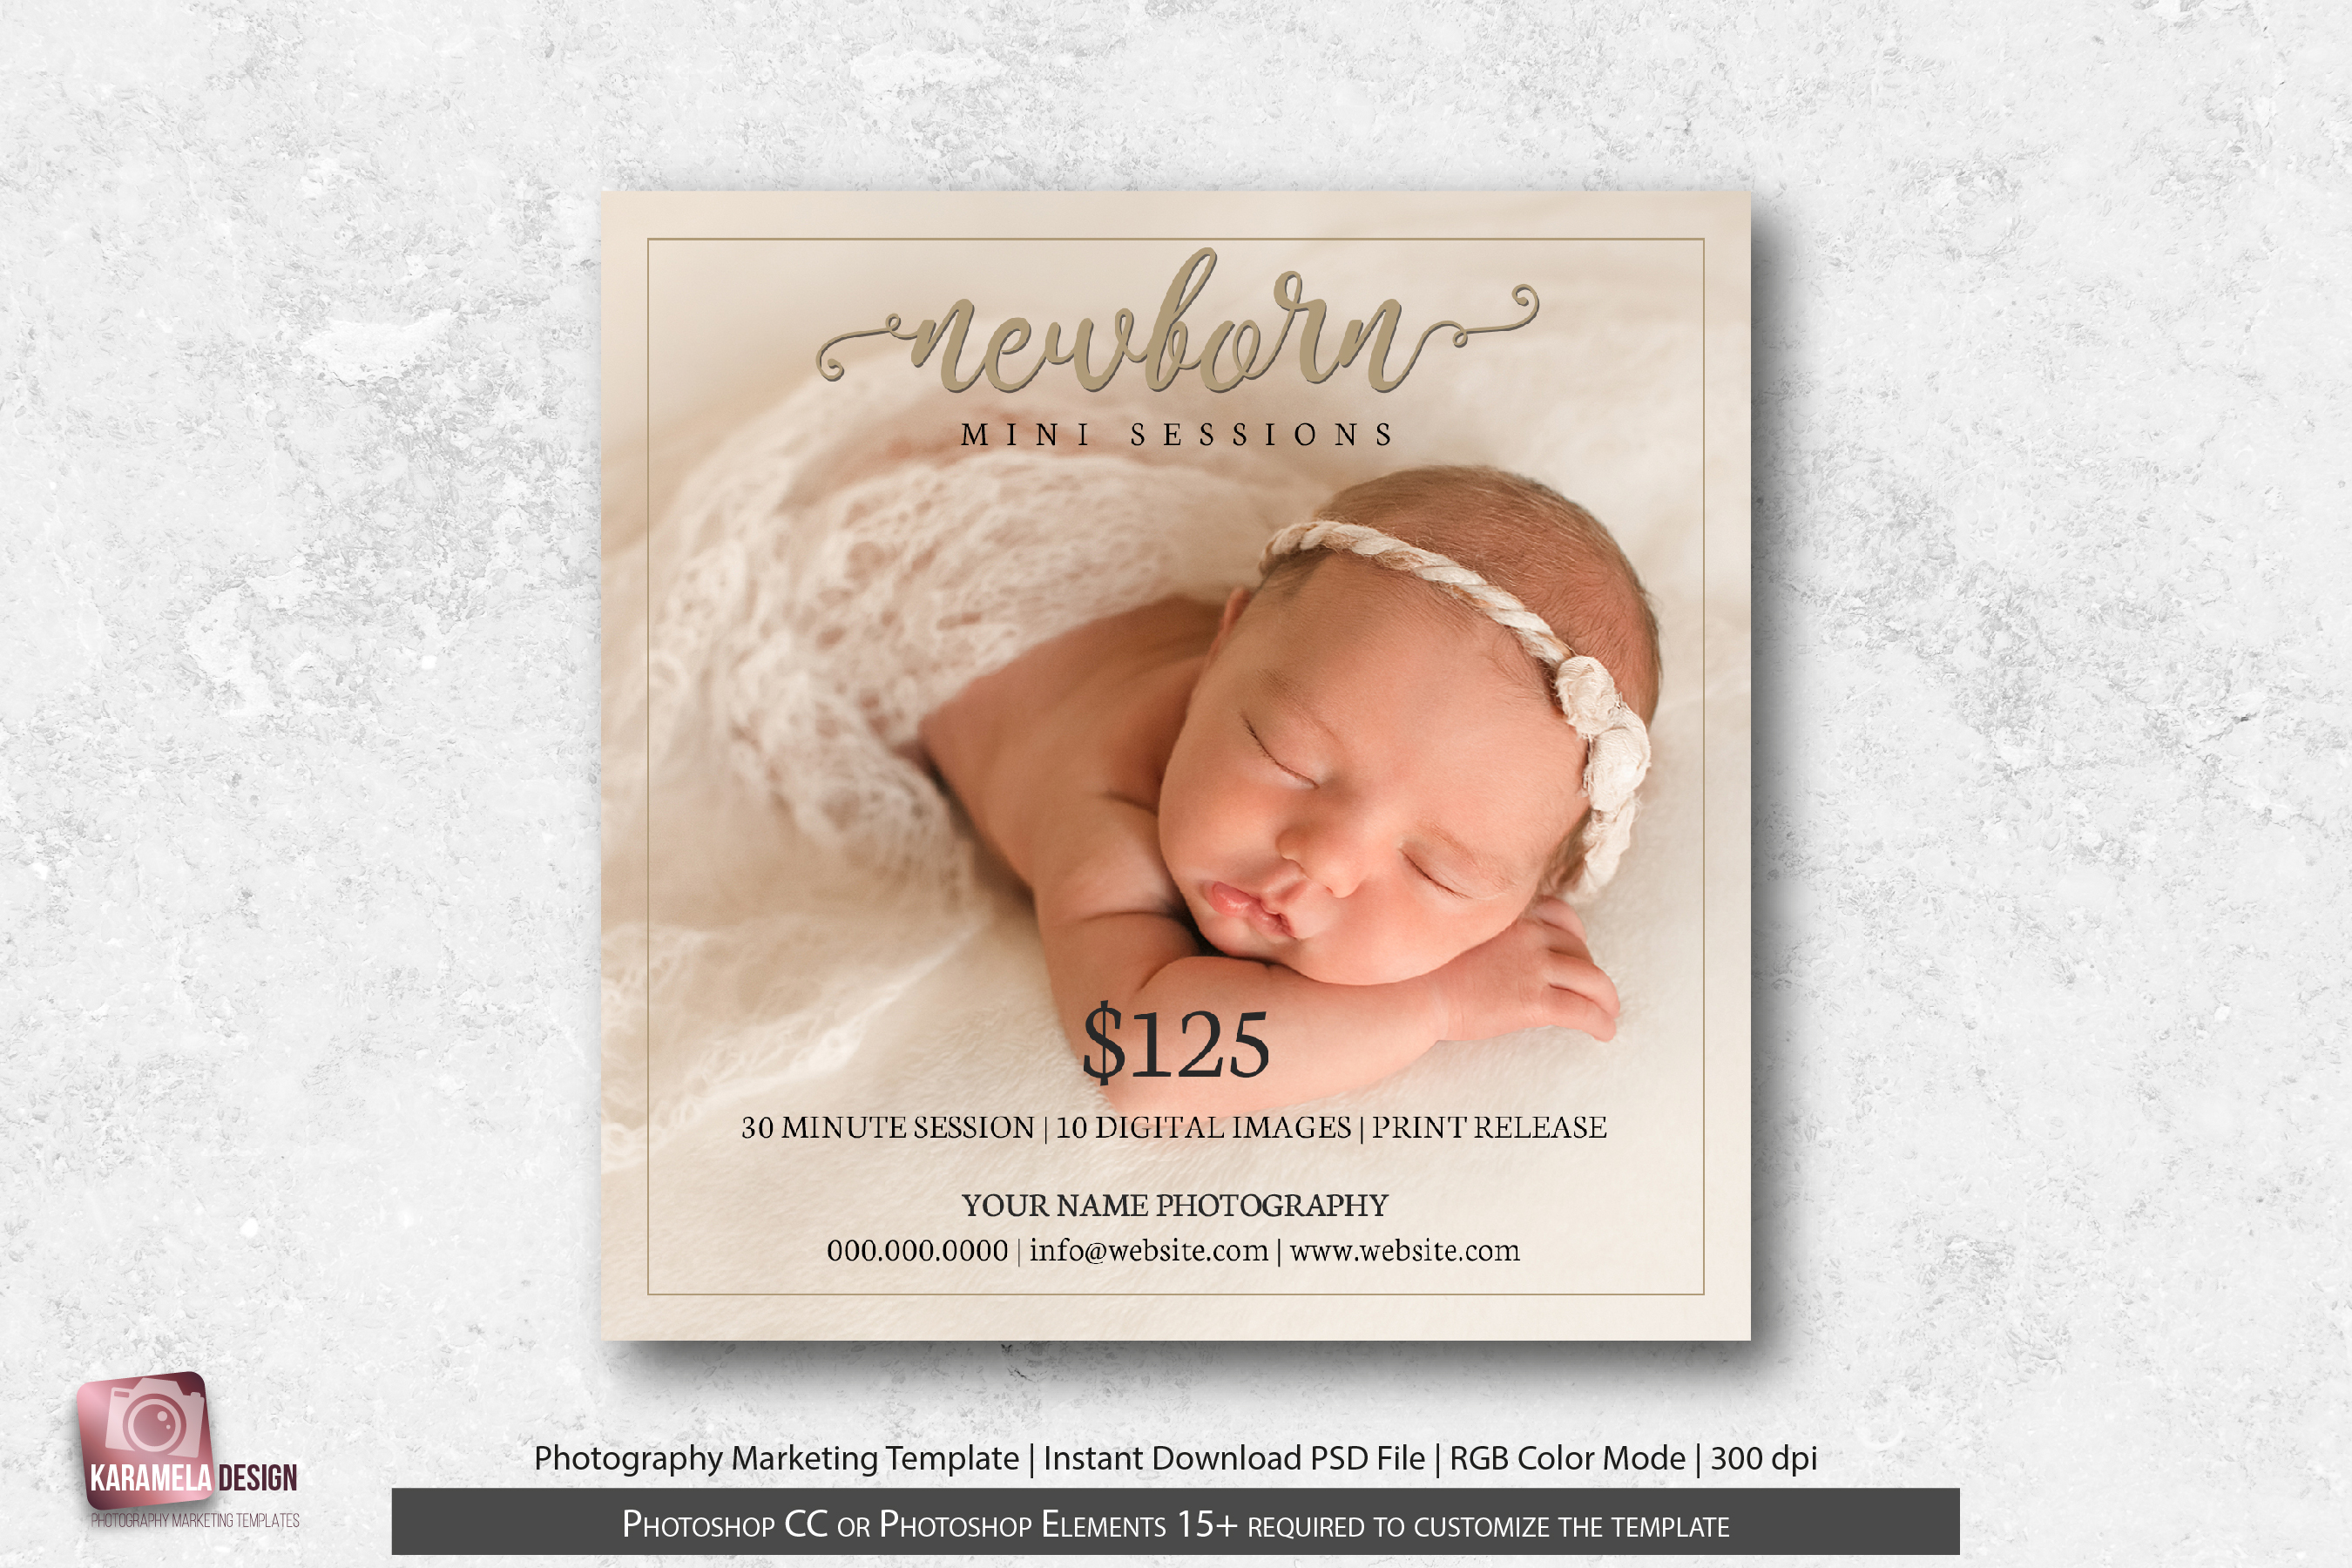 Newborn Mini Sessions Template example image 1